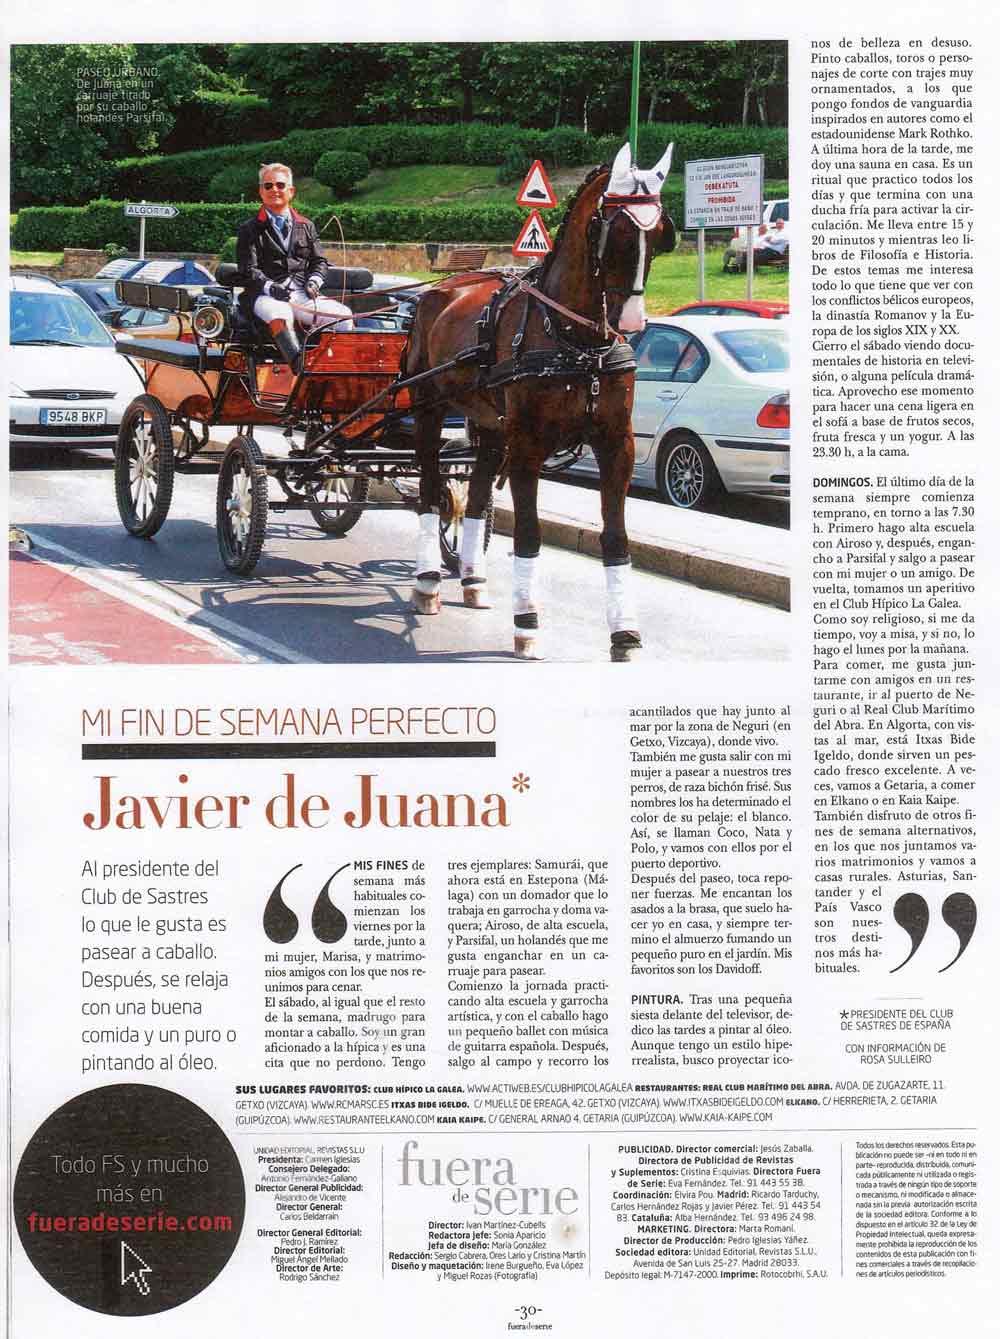 Reportaje Fuera de Serie - Expansión - Javier de Juana